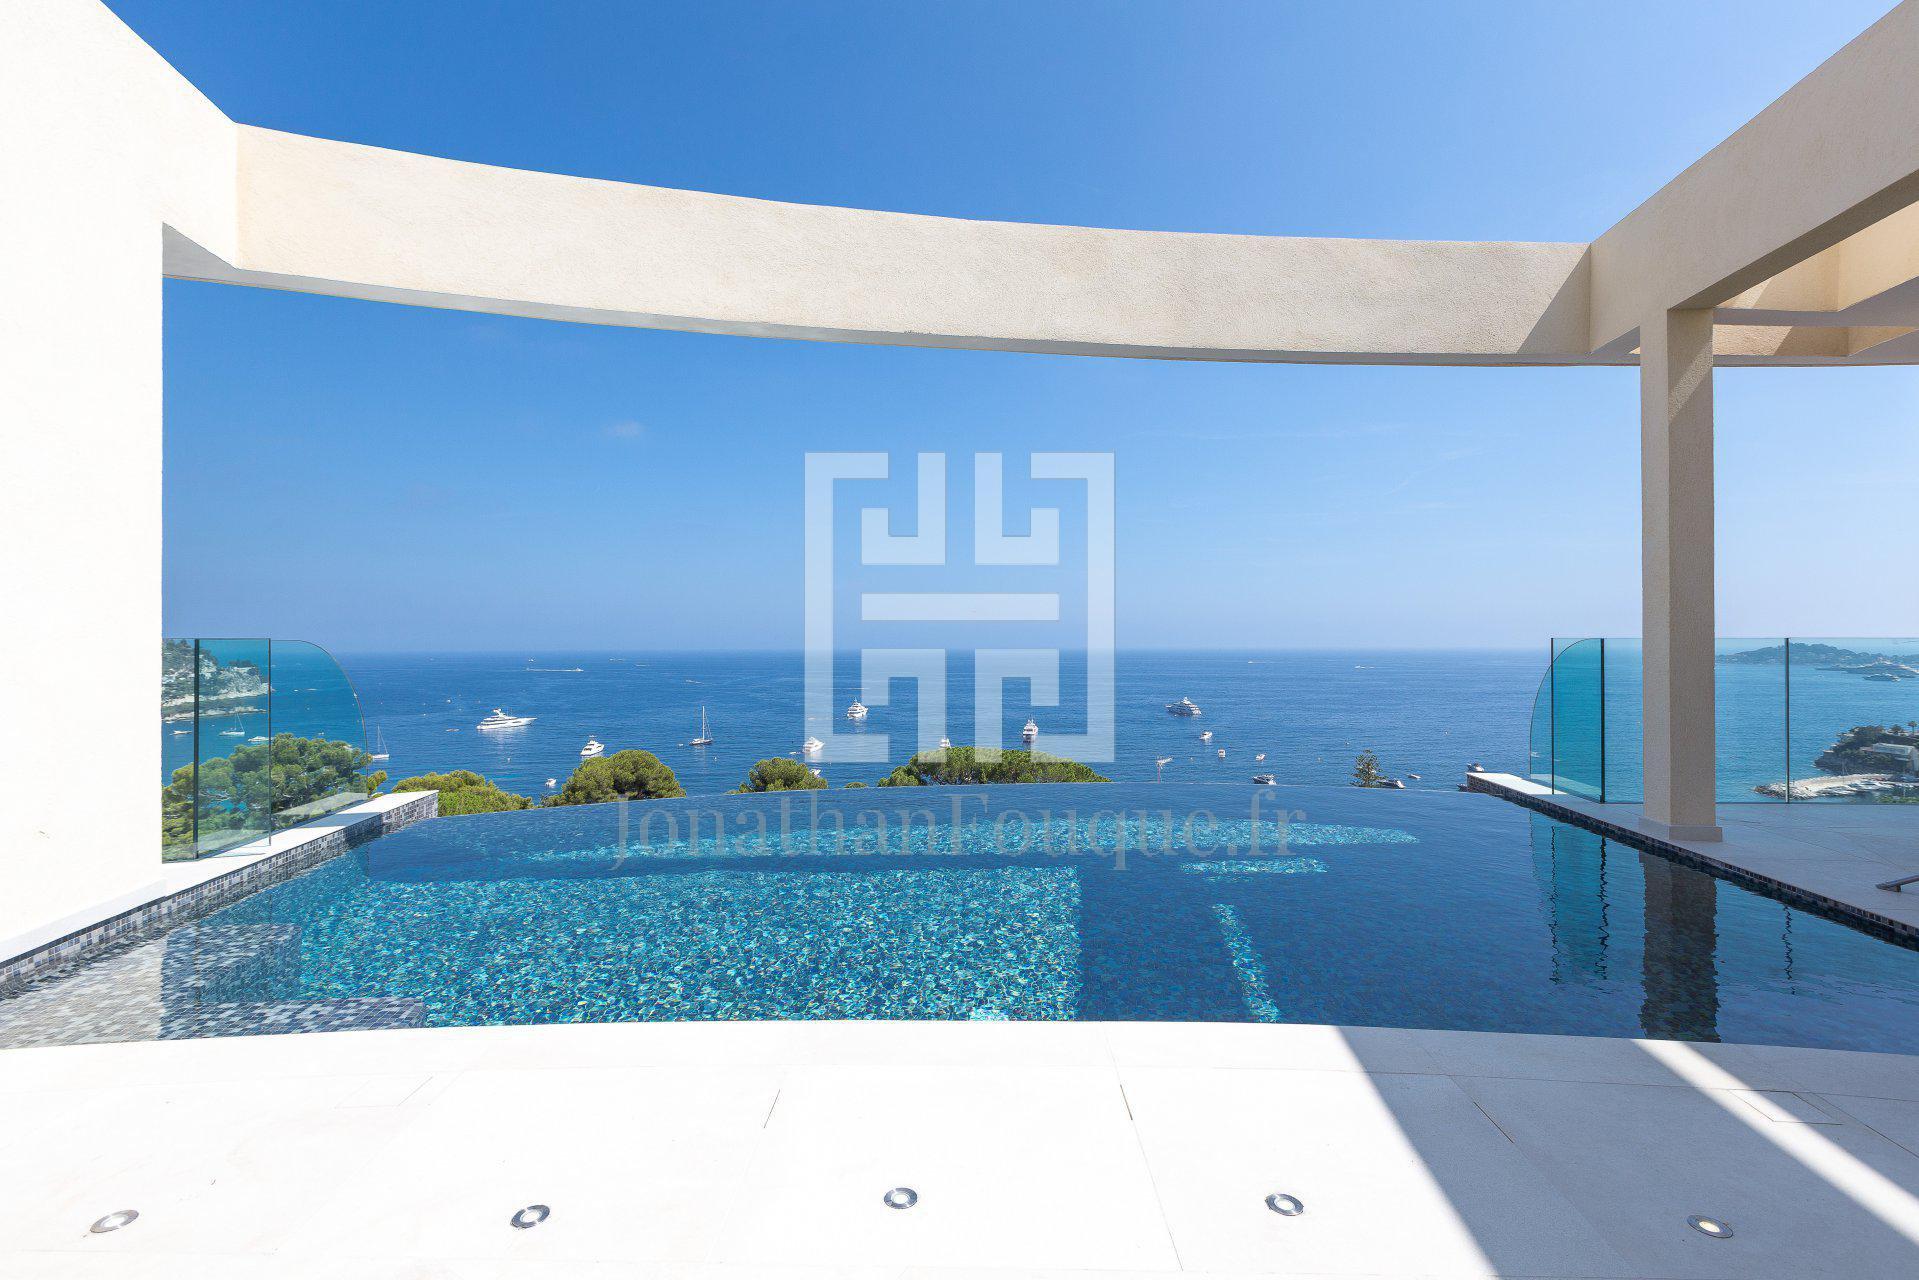 Monaco - Luxury property of architect on the sea